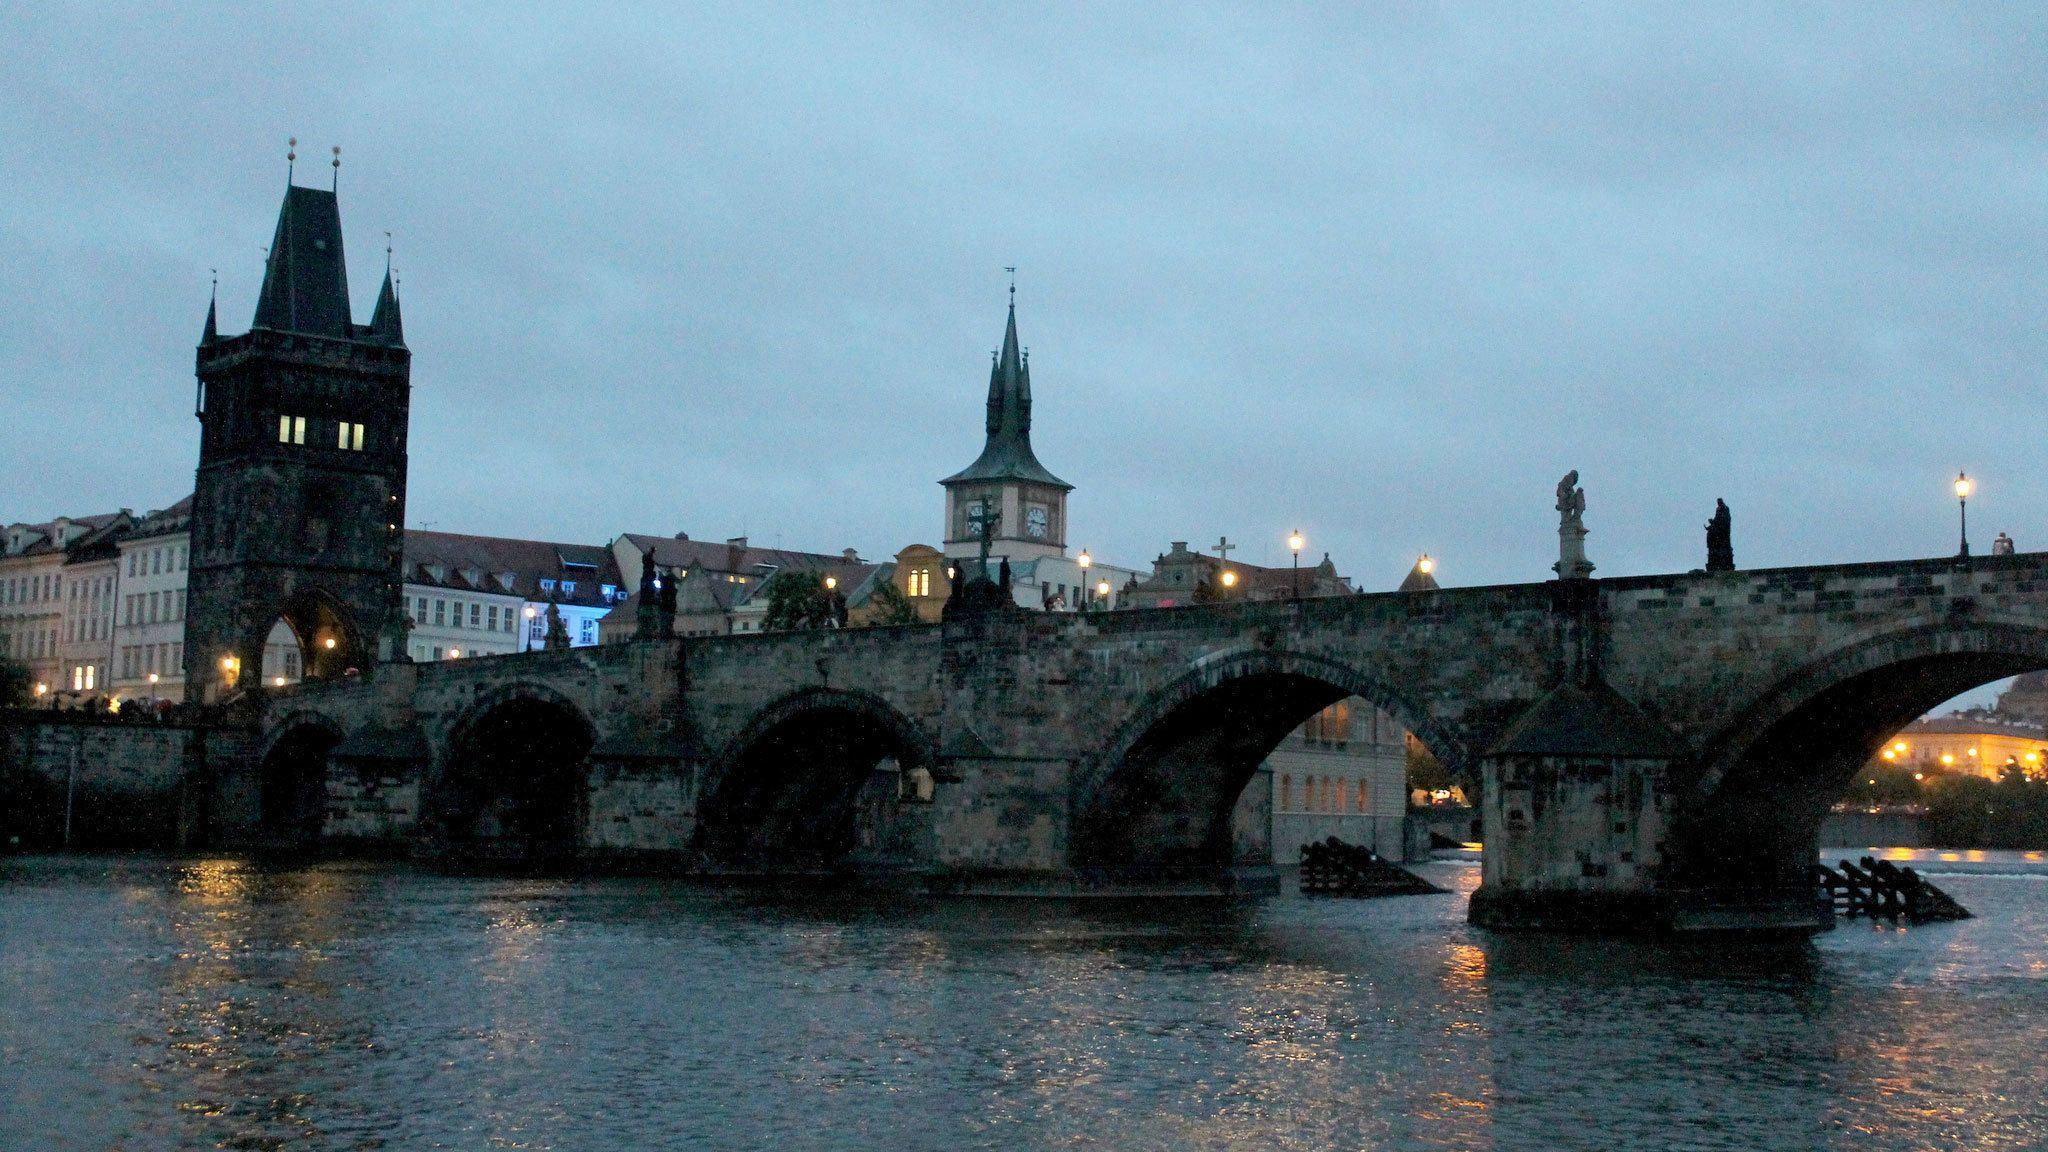 The Charles Bridge at night in Prague